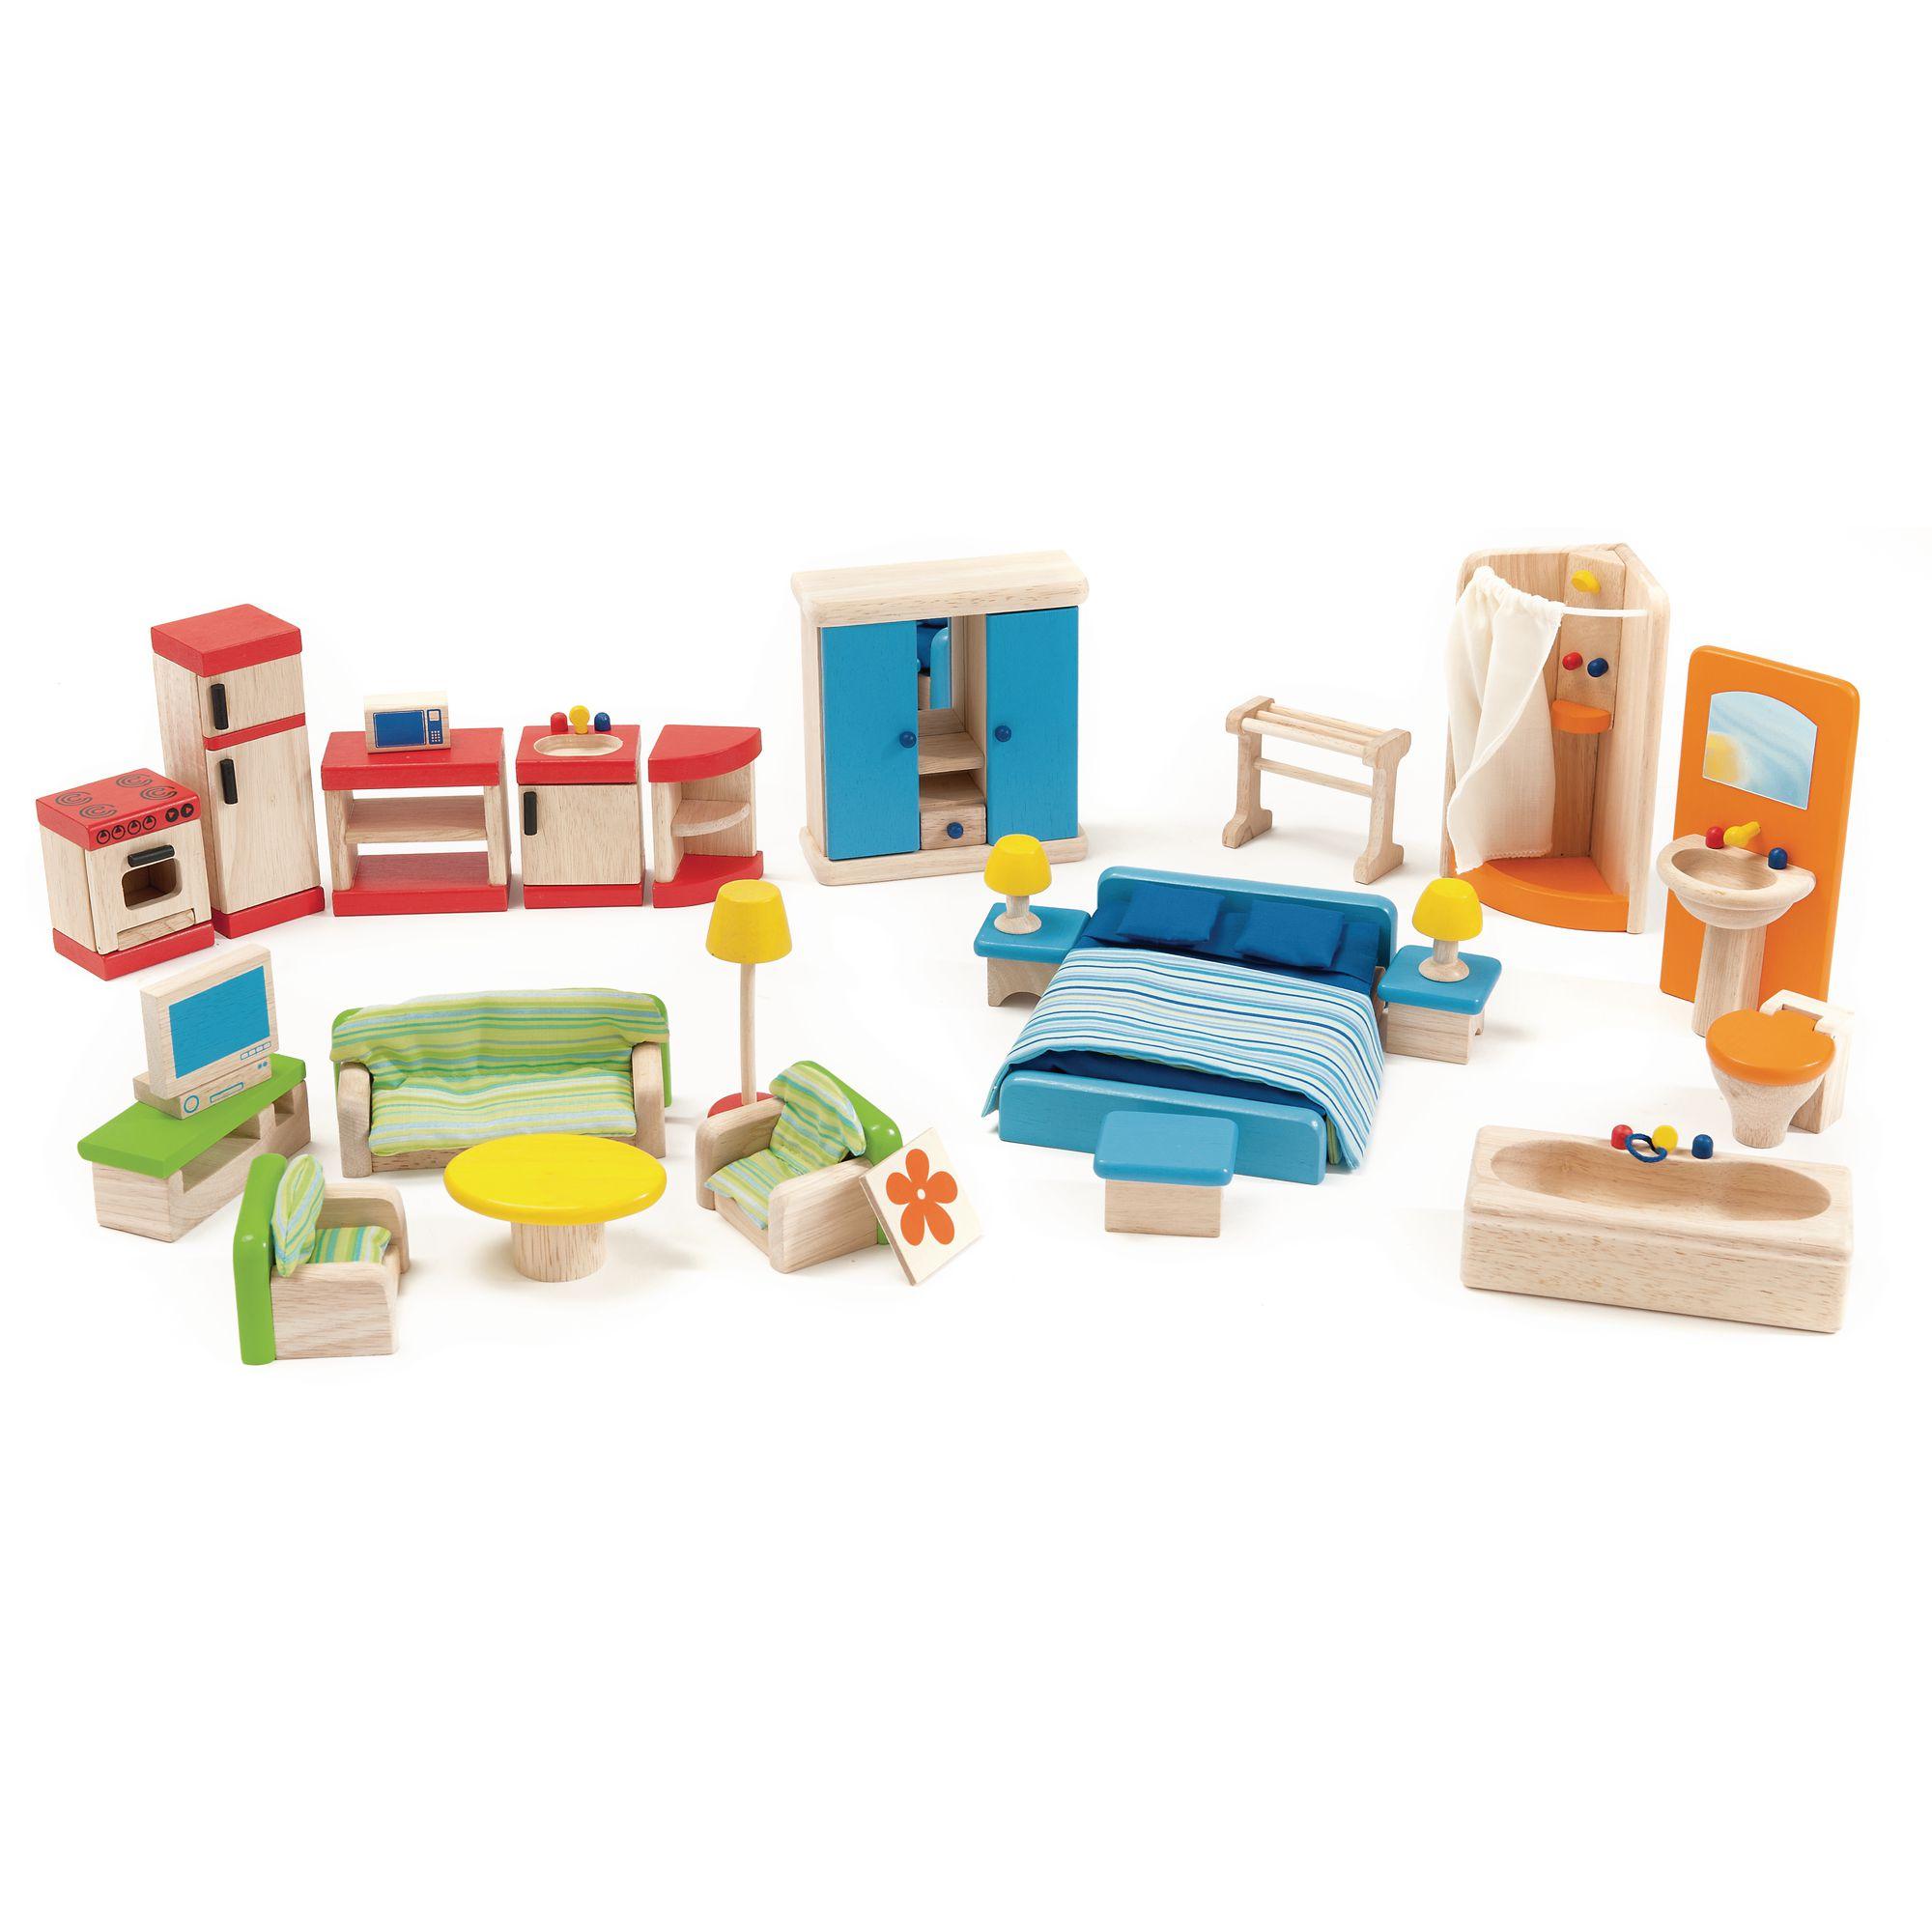 Cheap dolls house furniture sets Barbie Doll Hope Education Dolls House Furniture Hope Education